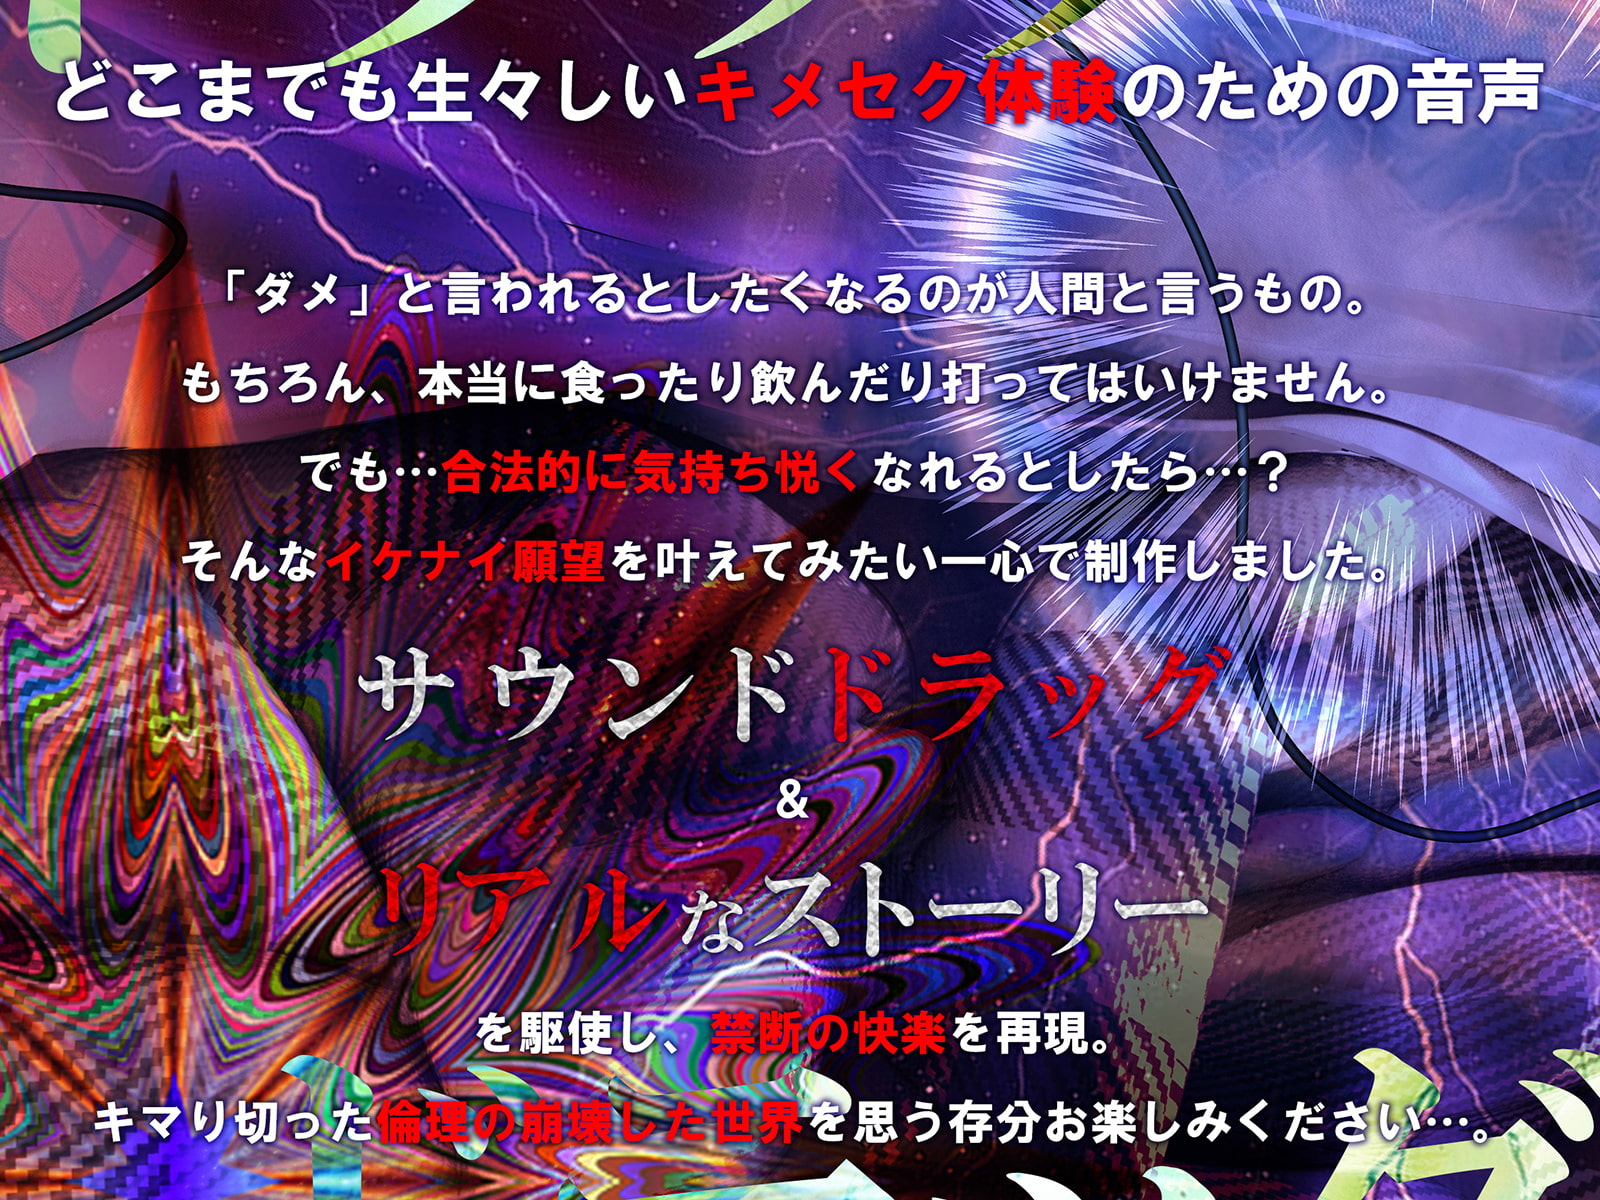 RJ347758 キメセクレイパー~性本能ヲ開放セヨ~ [20211011]